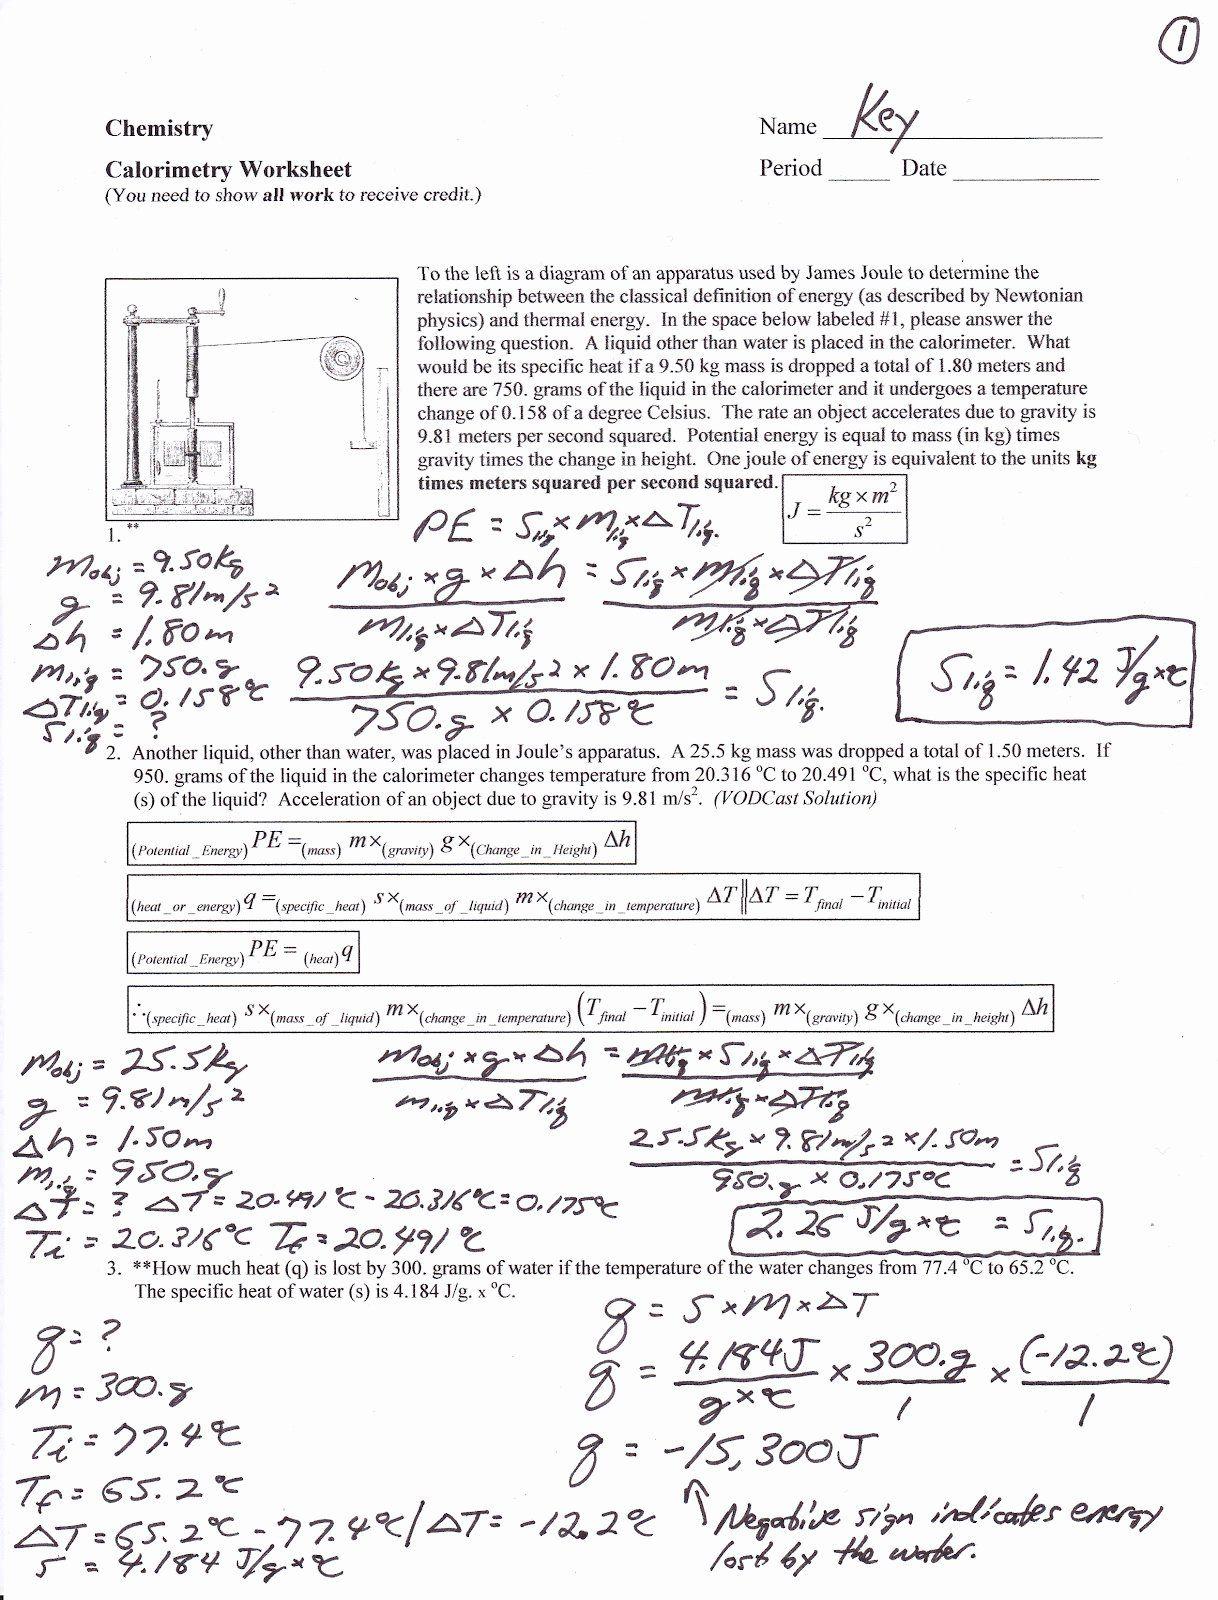 Calorimetry Worksheet Answer Key Awesome Mr Brueckner S